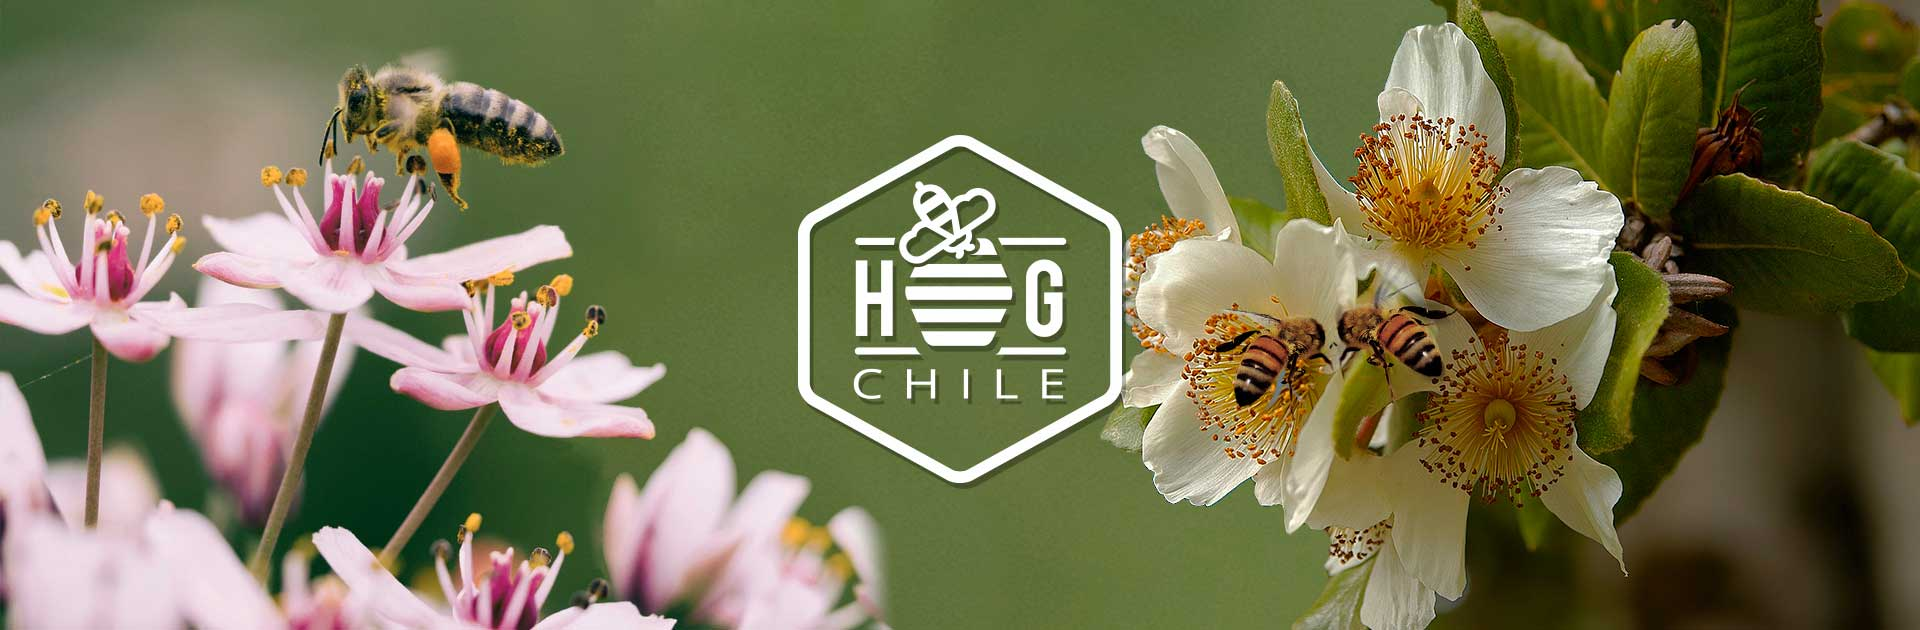 honey group chile